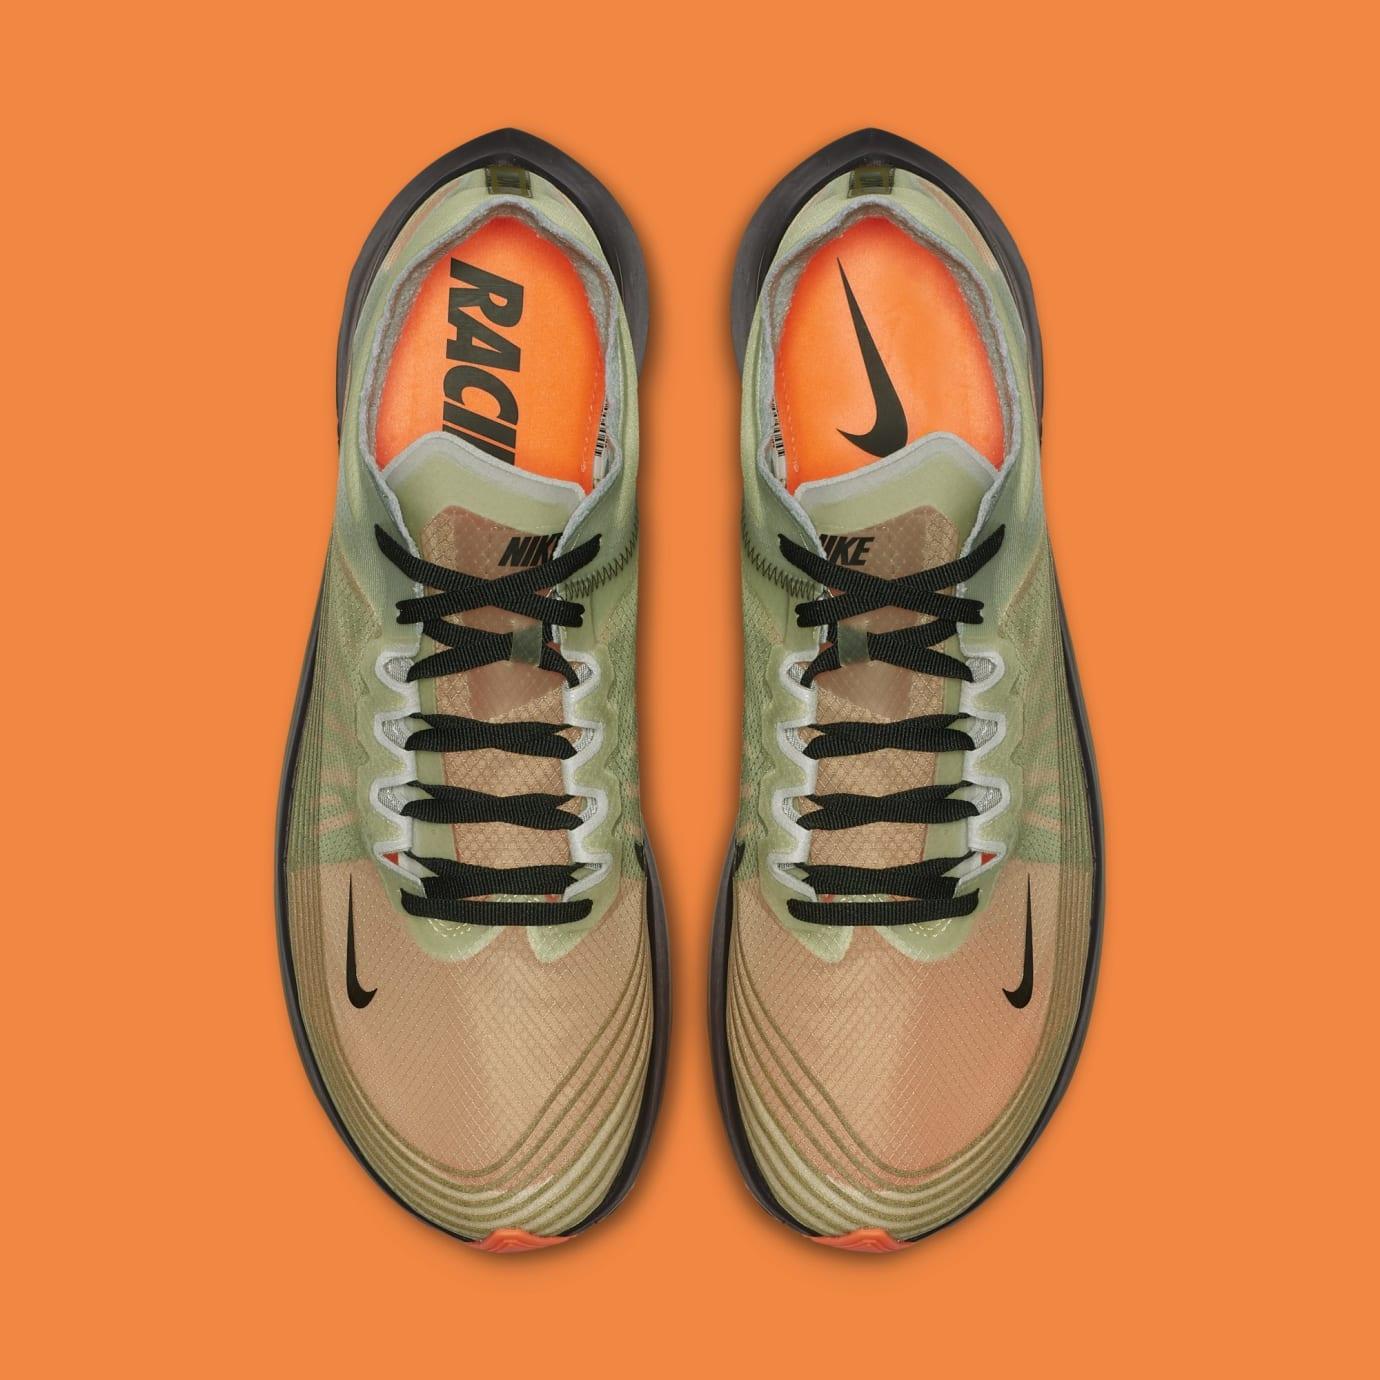 Nike Zoom Fly SP 'Medium Olive/Black' AJ9282-200 (Top)